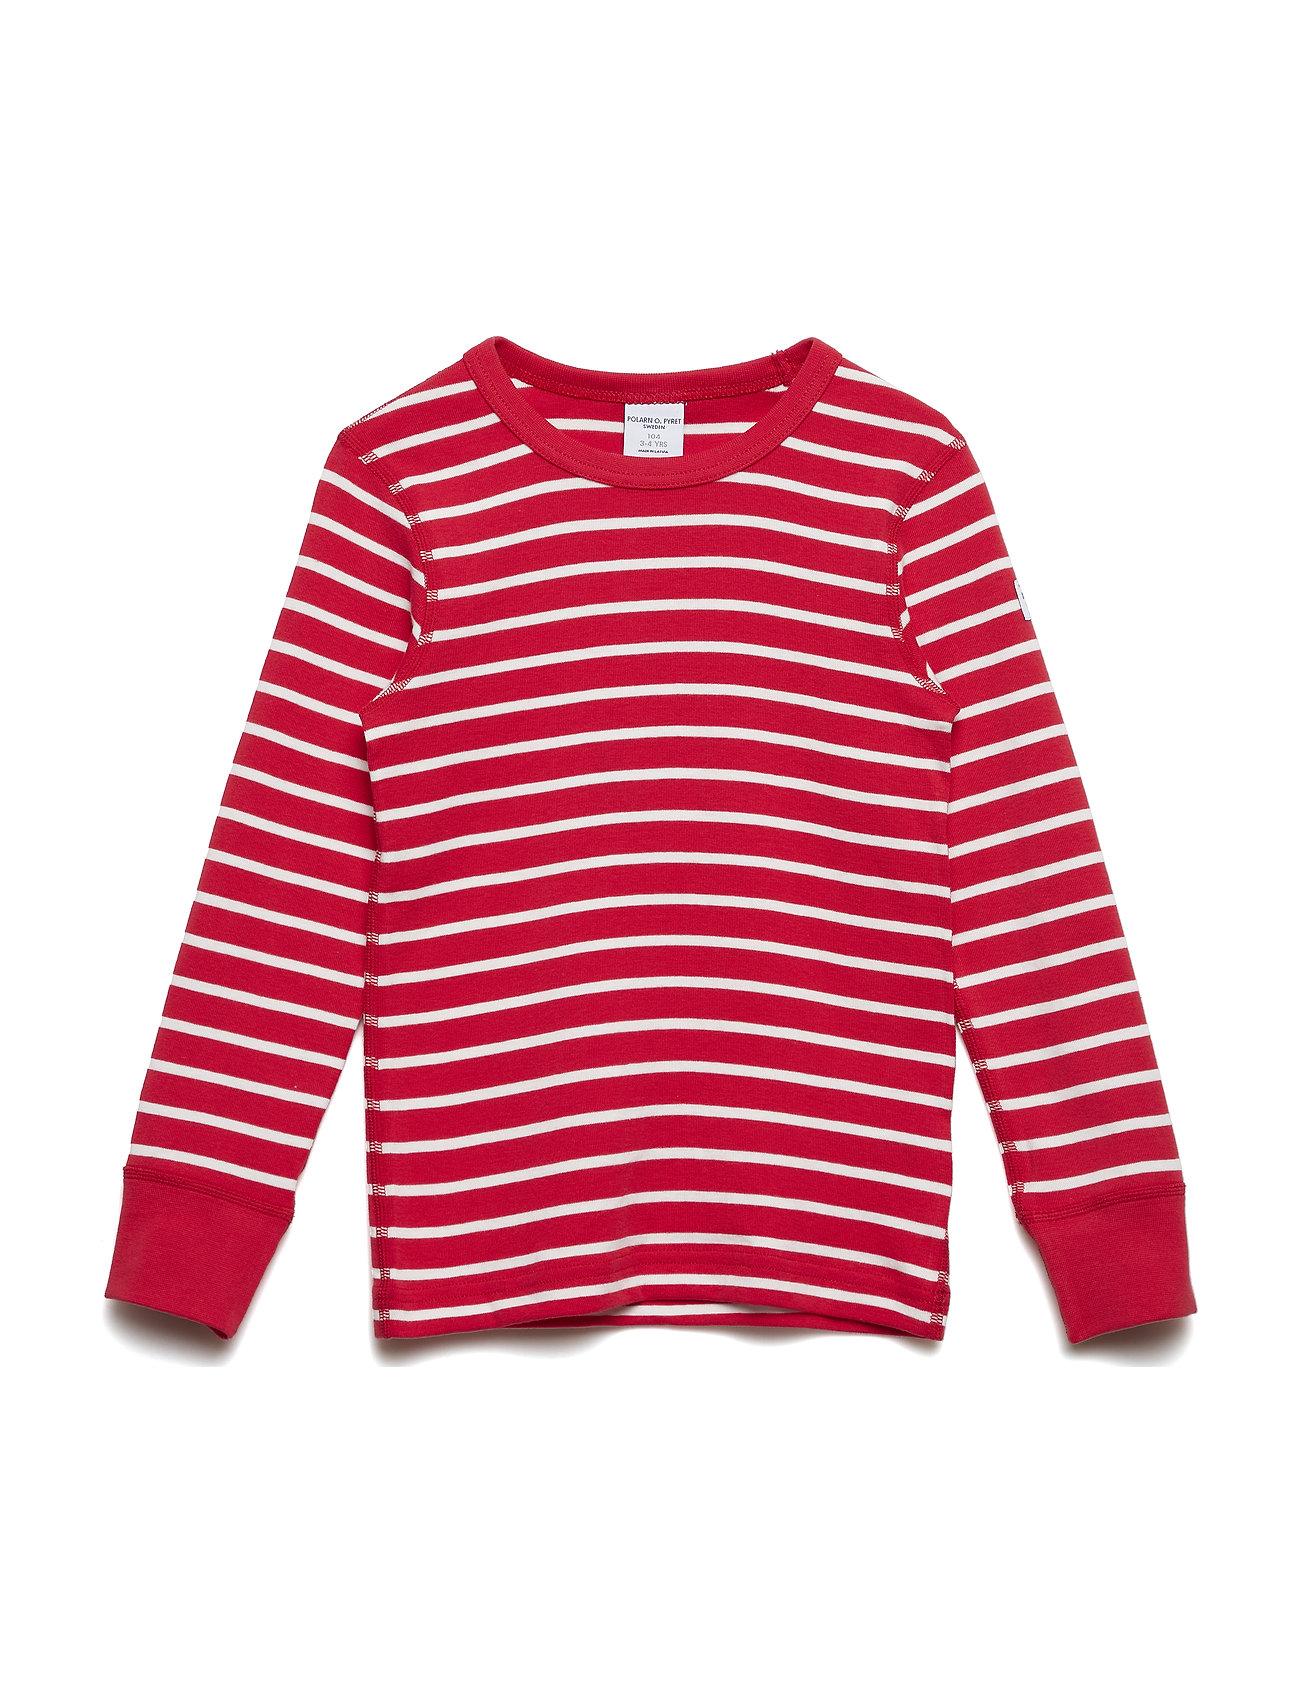 Polarn O. Pyret T-shirt l/s PO.P Stripe - SKI PATROL